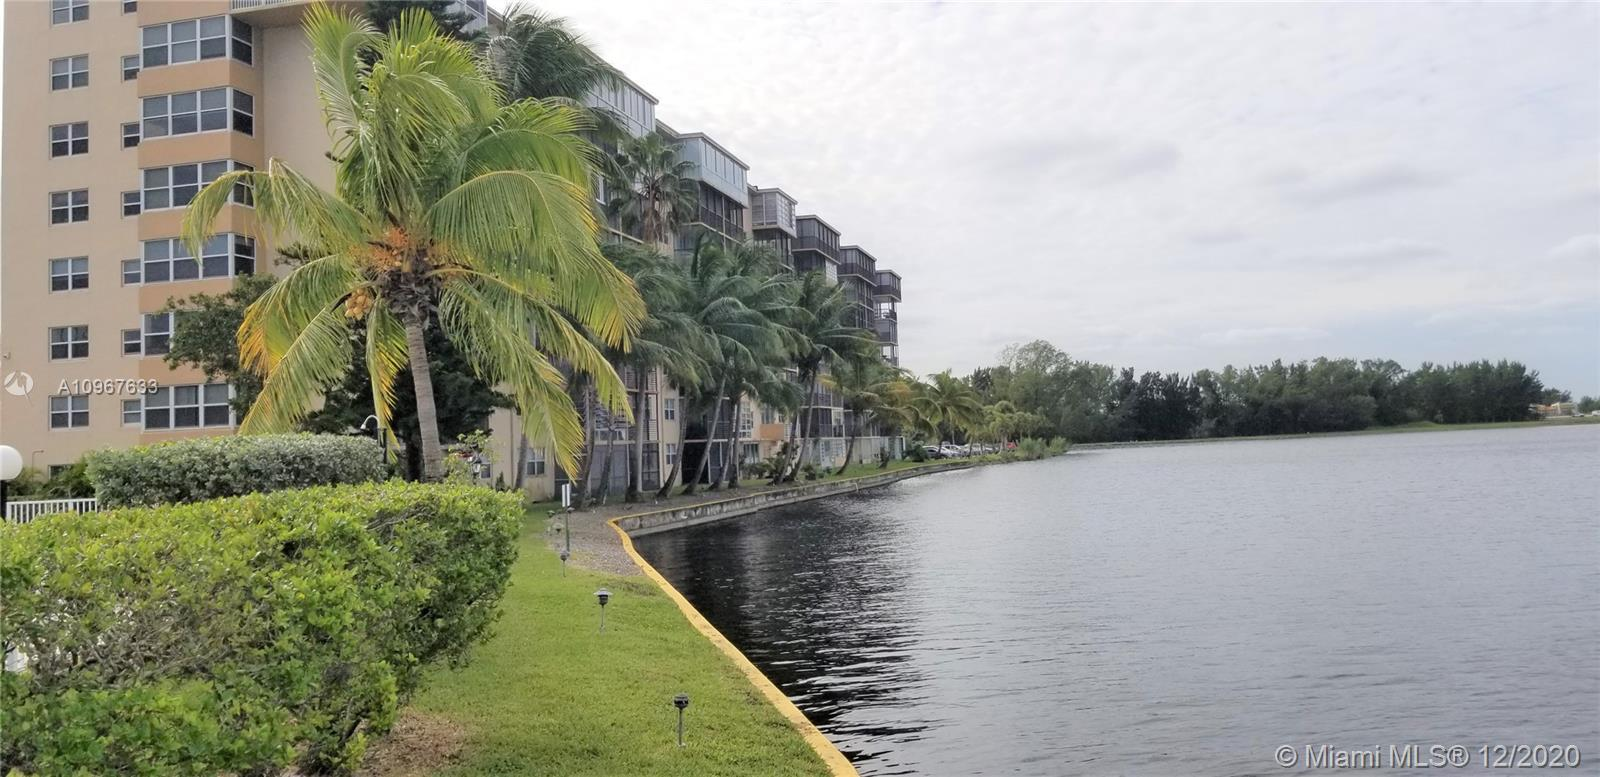 1075 NE Miami Gardens Dr Unit: 408 preview